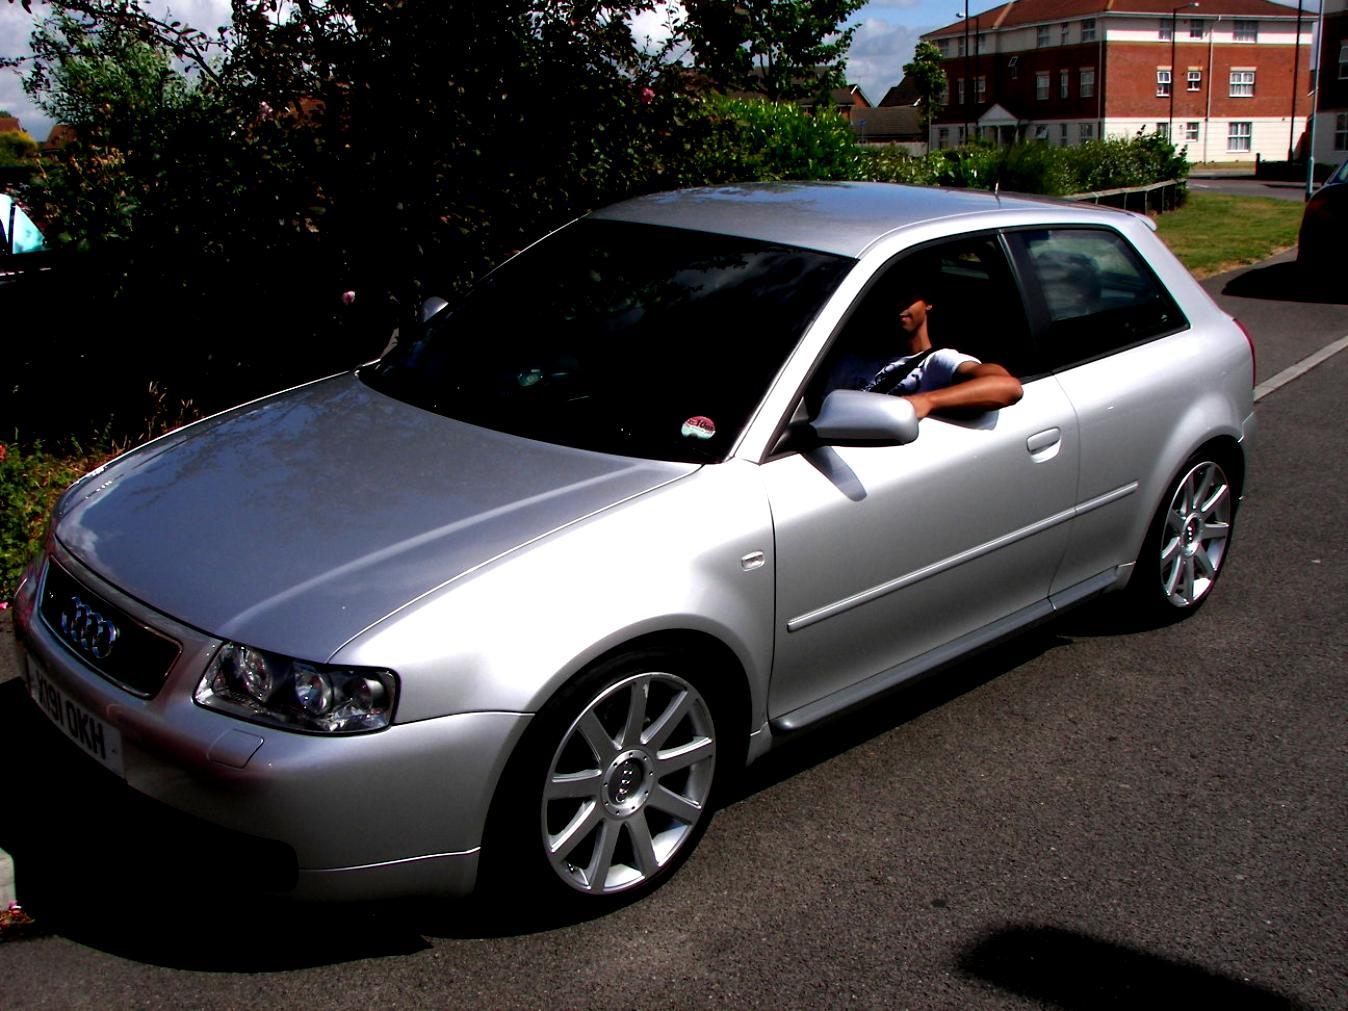 Kelebihan Audi S3 2001 Murah Berkualitas